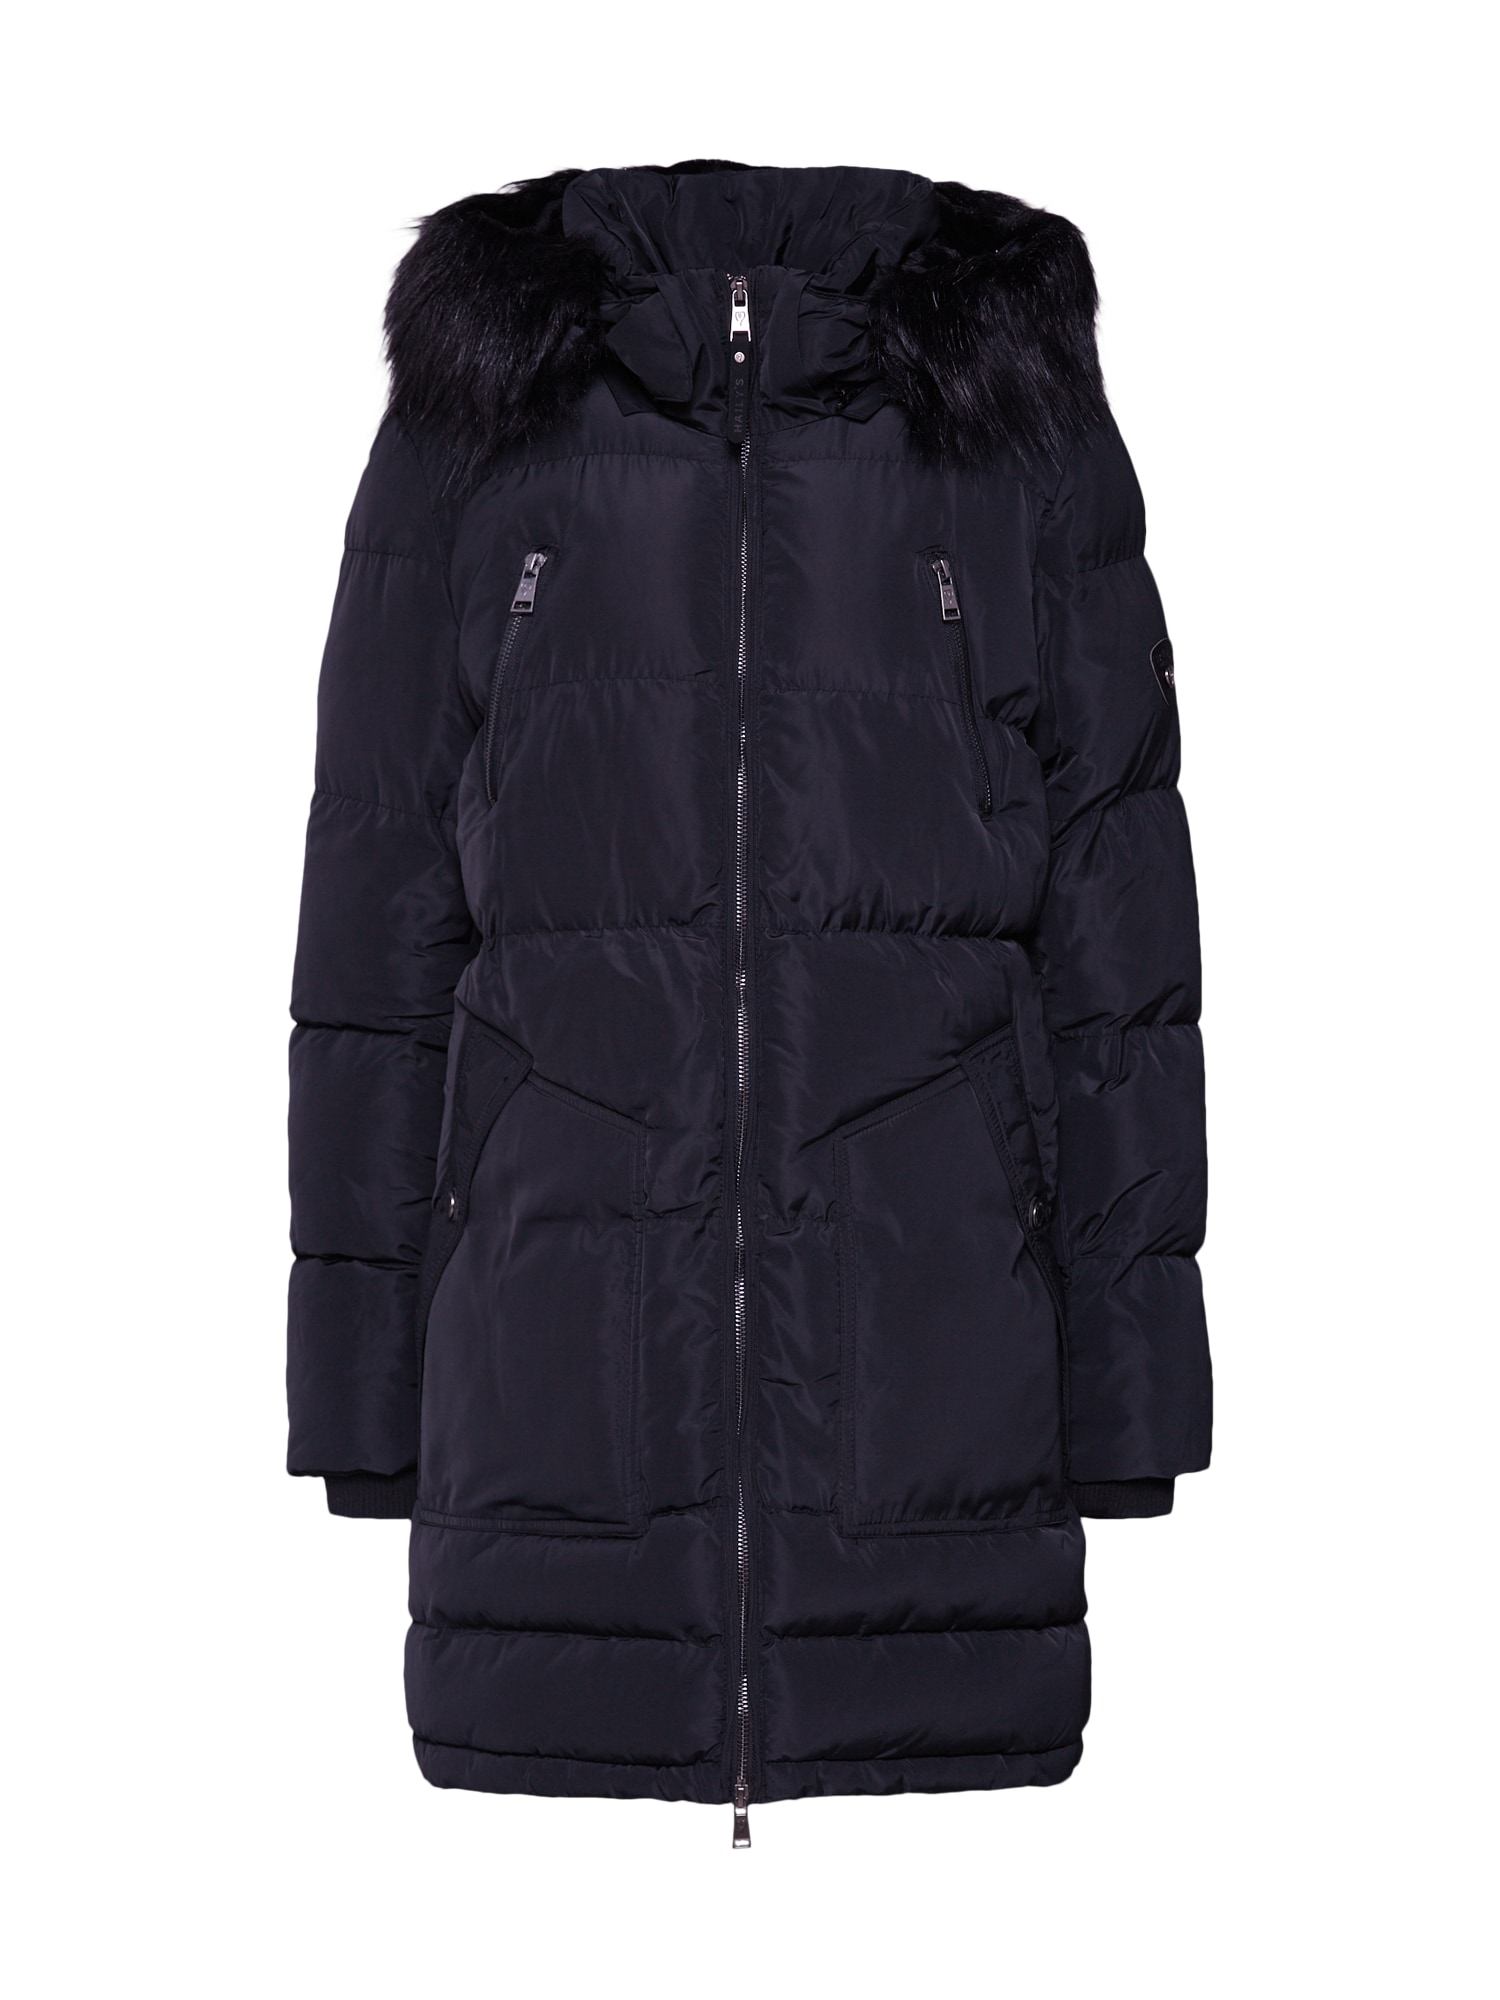 Hailys Rudeninis-žieminis paltas 'LS P JK Valentina' juoda